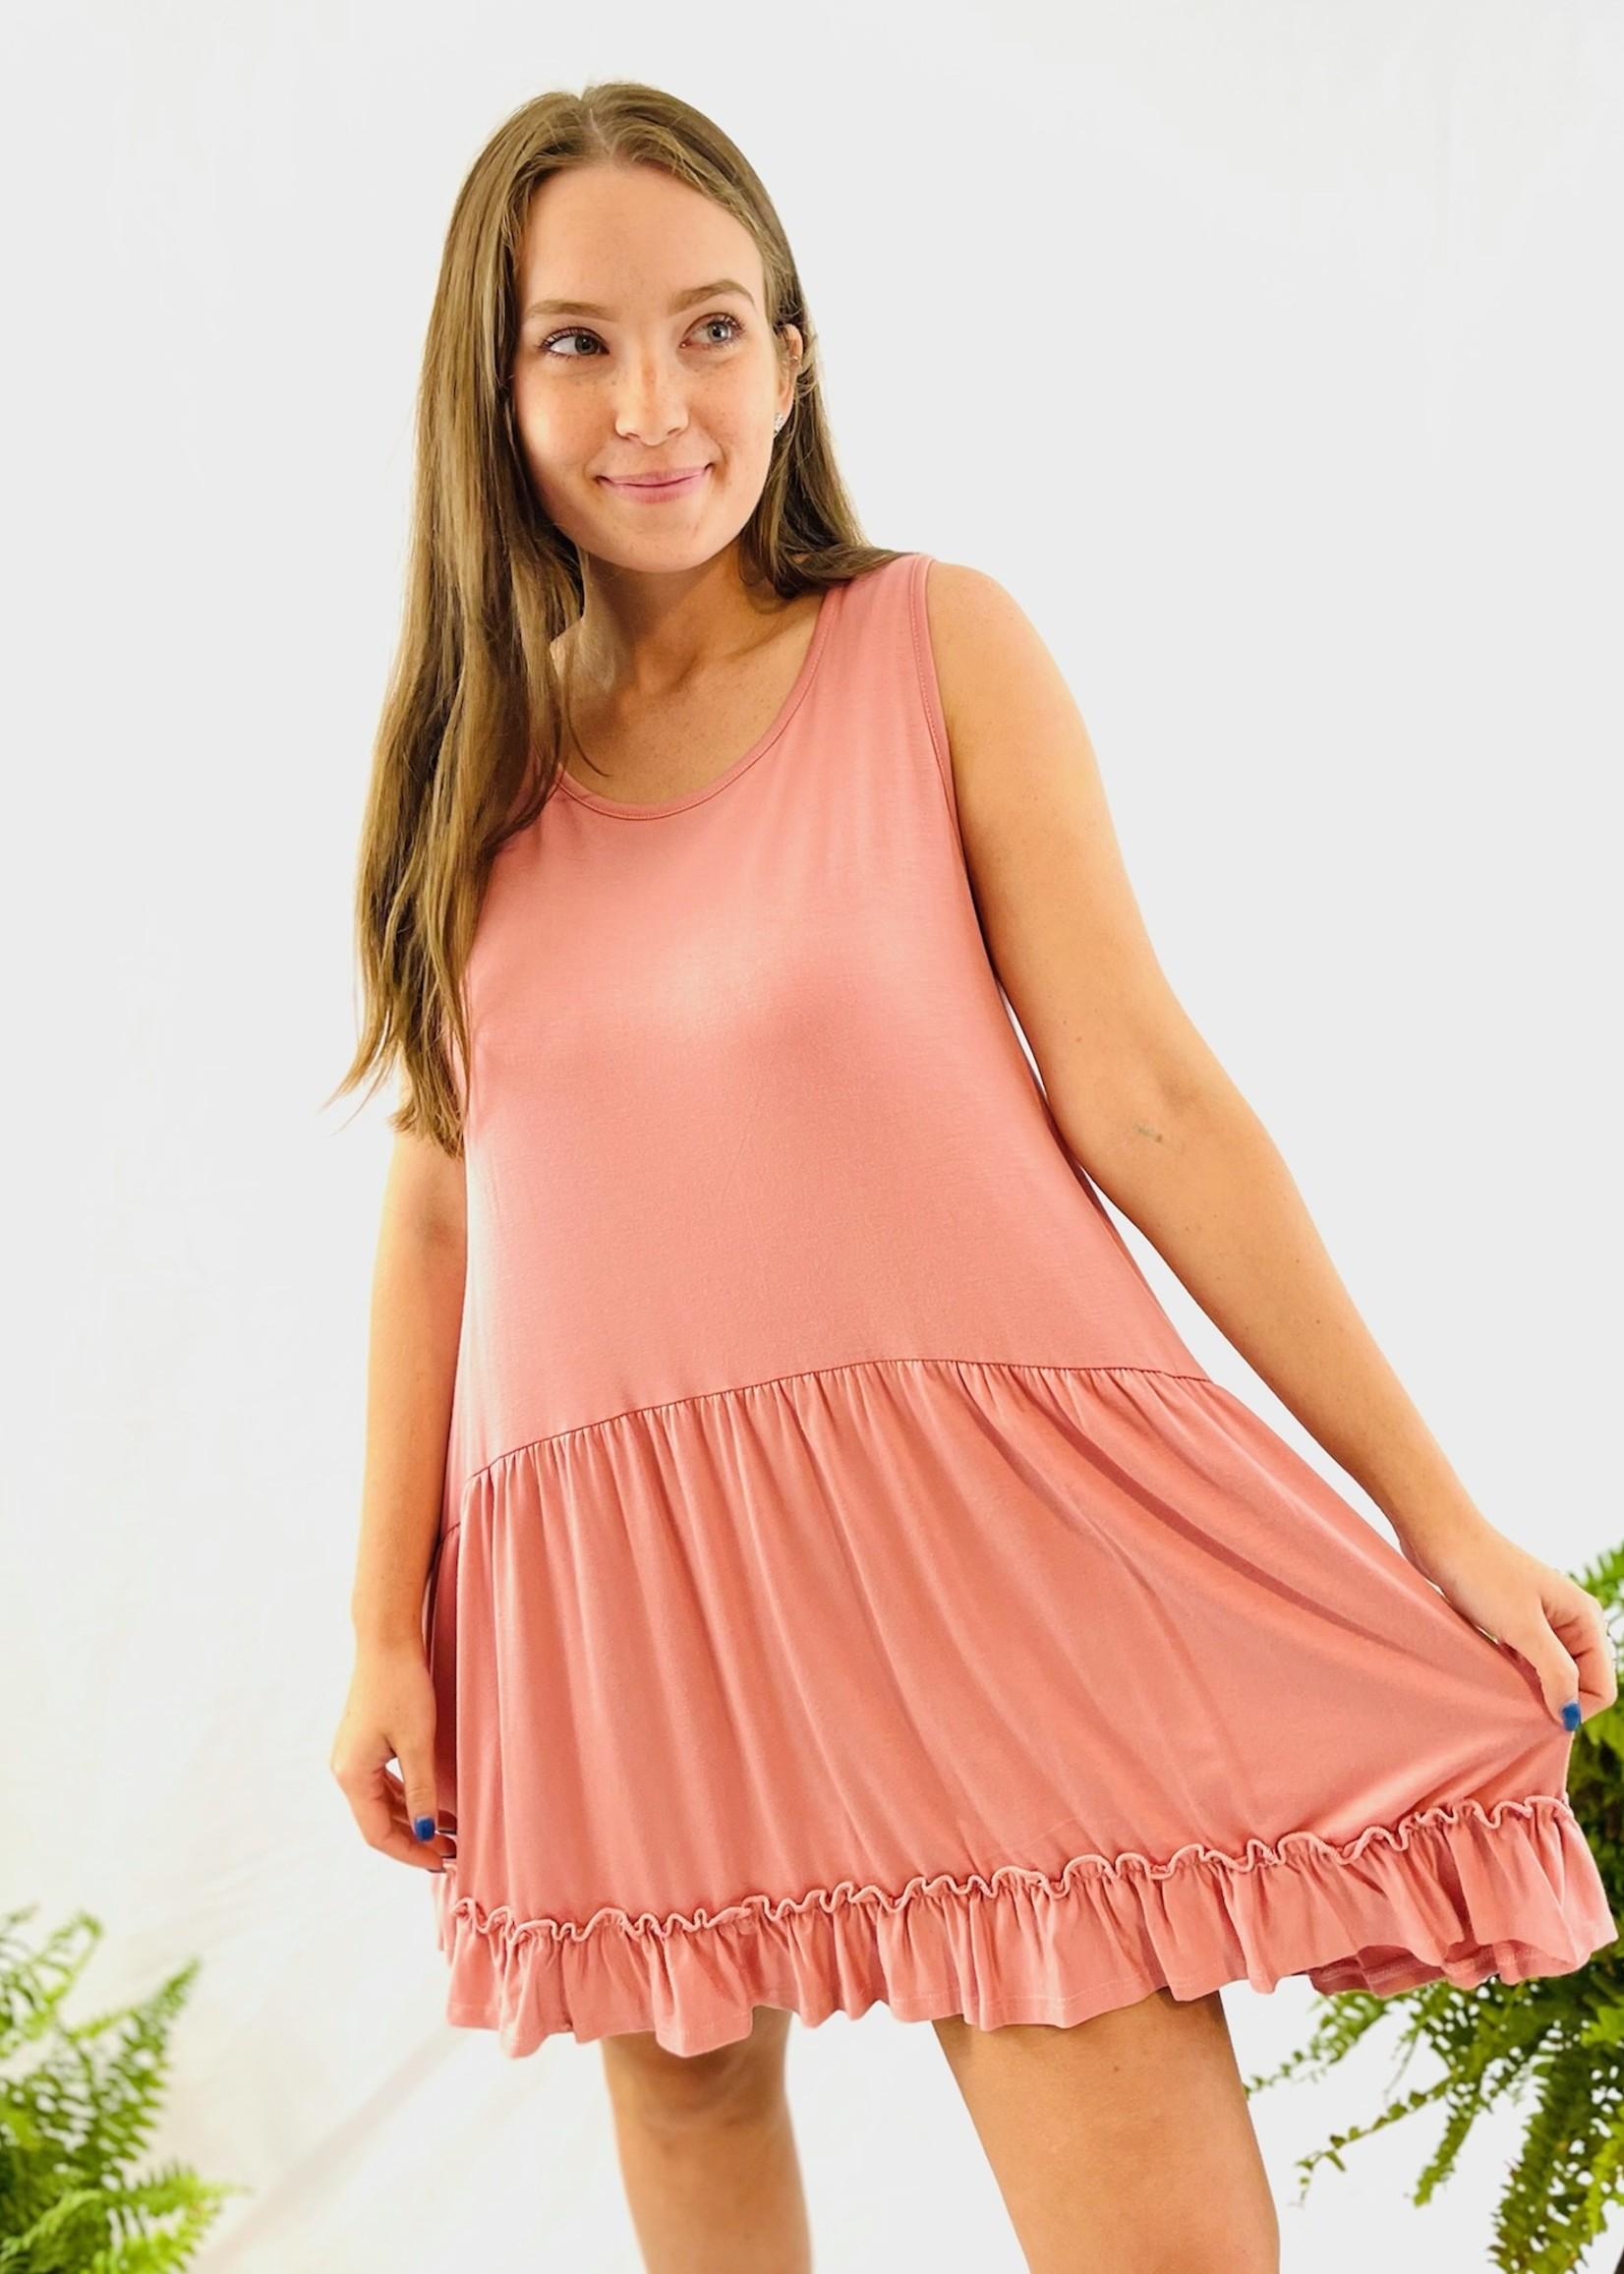 Tunic Top/Dress with Ruffles